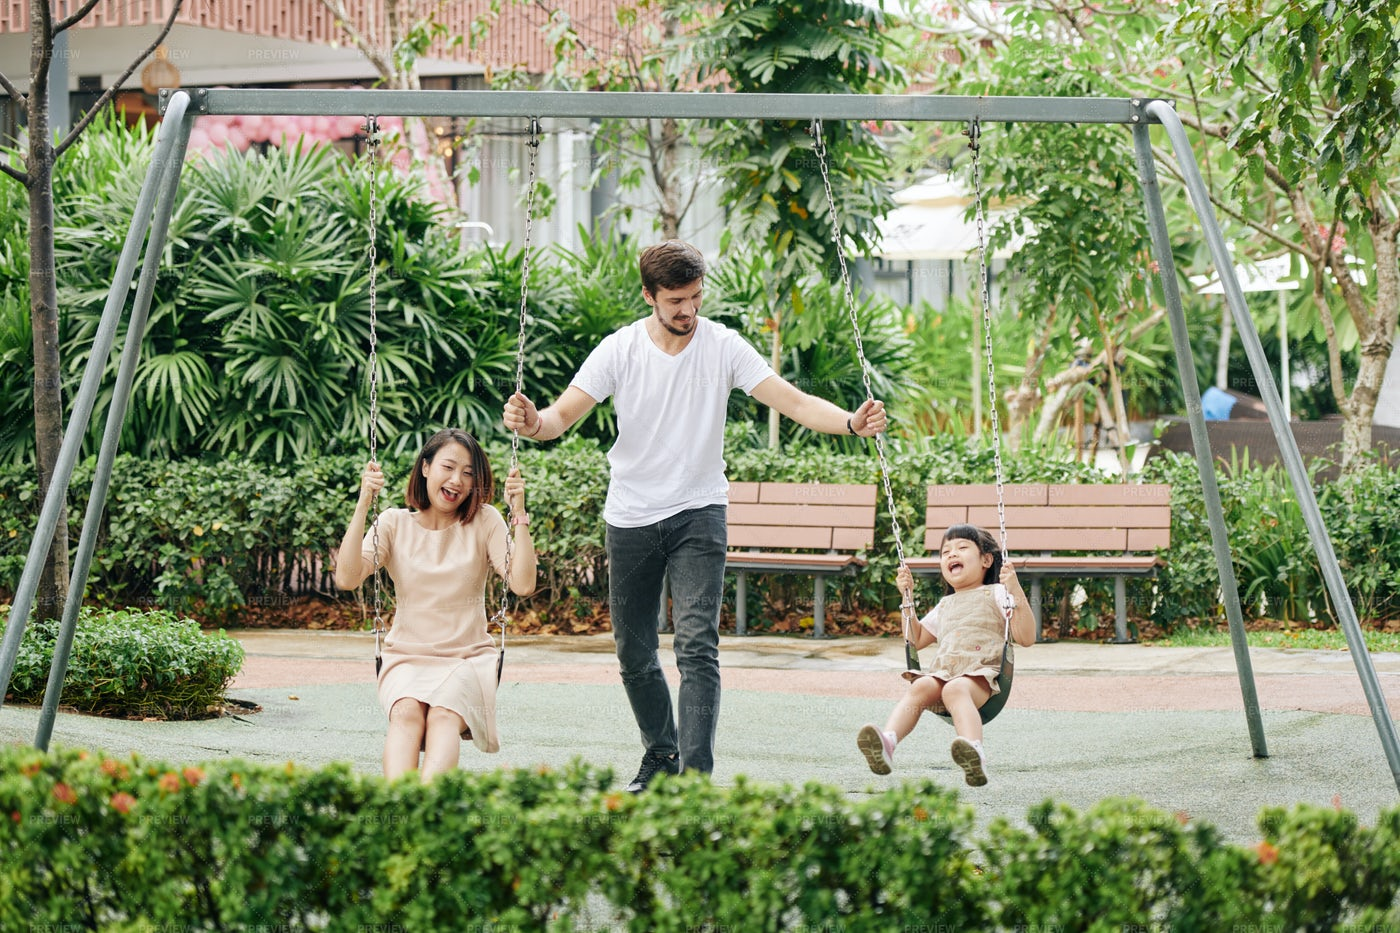 Family Spending Time In Park: Stock Photos